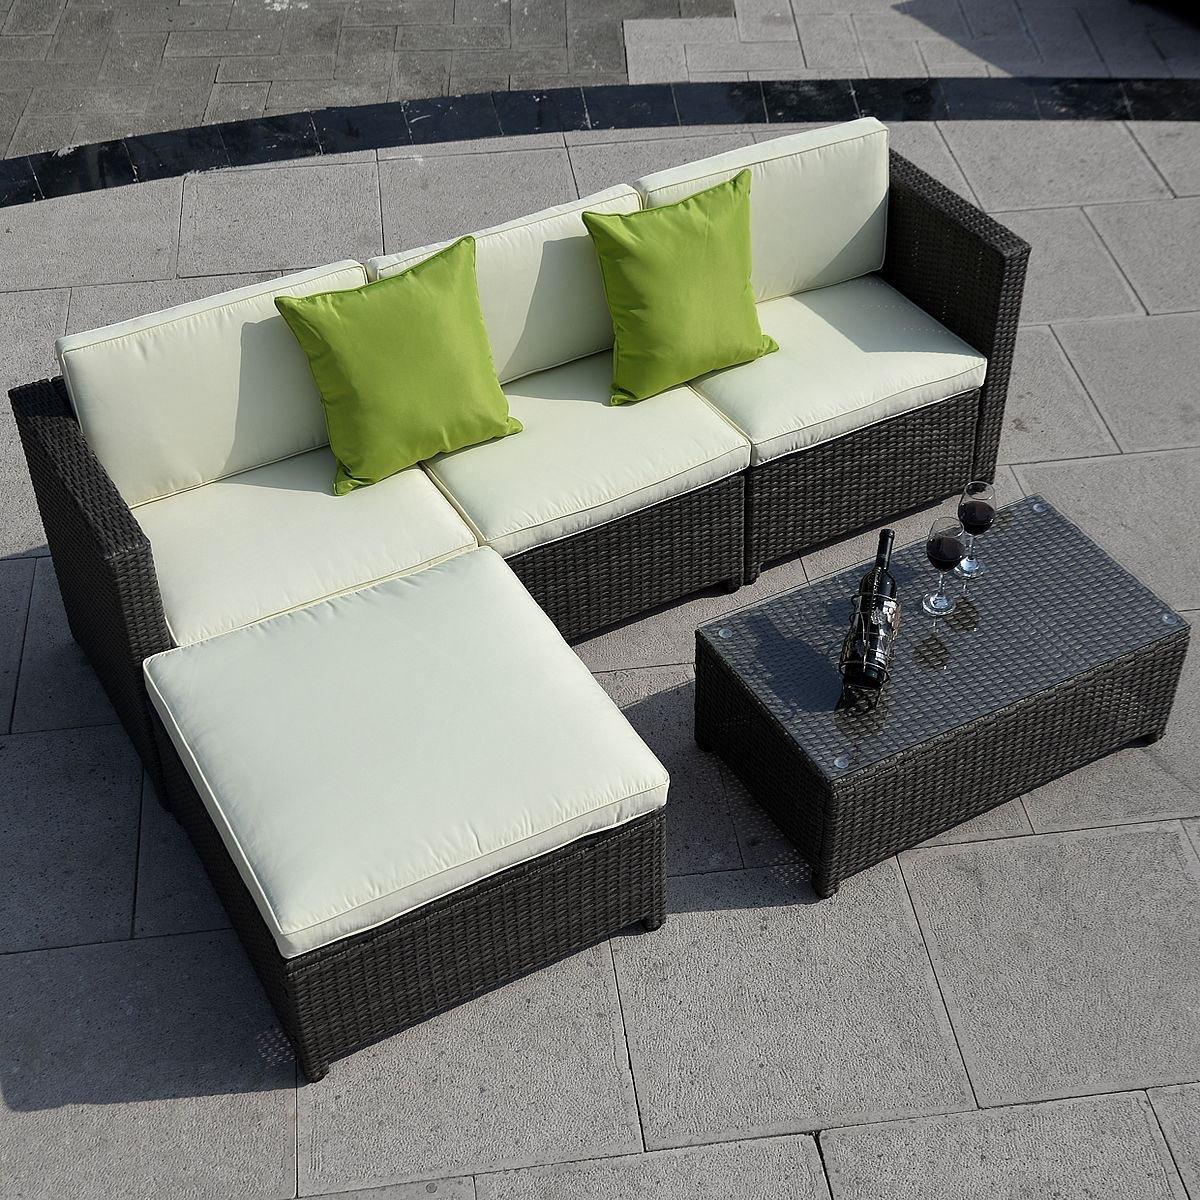 Amazon.com : 5pc Outdoor Patio Sofa Set Sectional Furniture Pe Wicker  Rattan Deck Couch (Brown) : Garden U0026 Outdoor